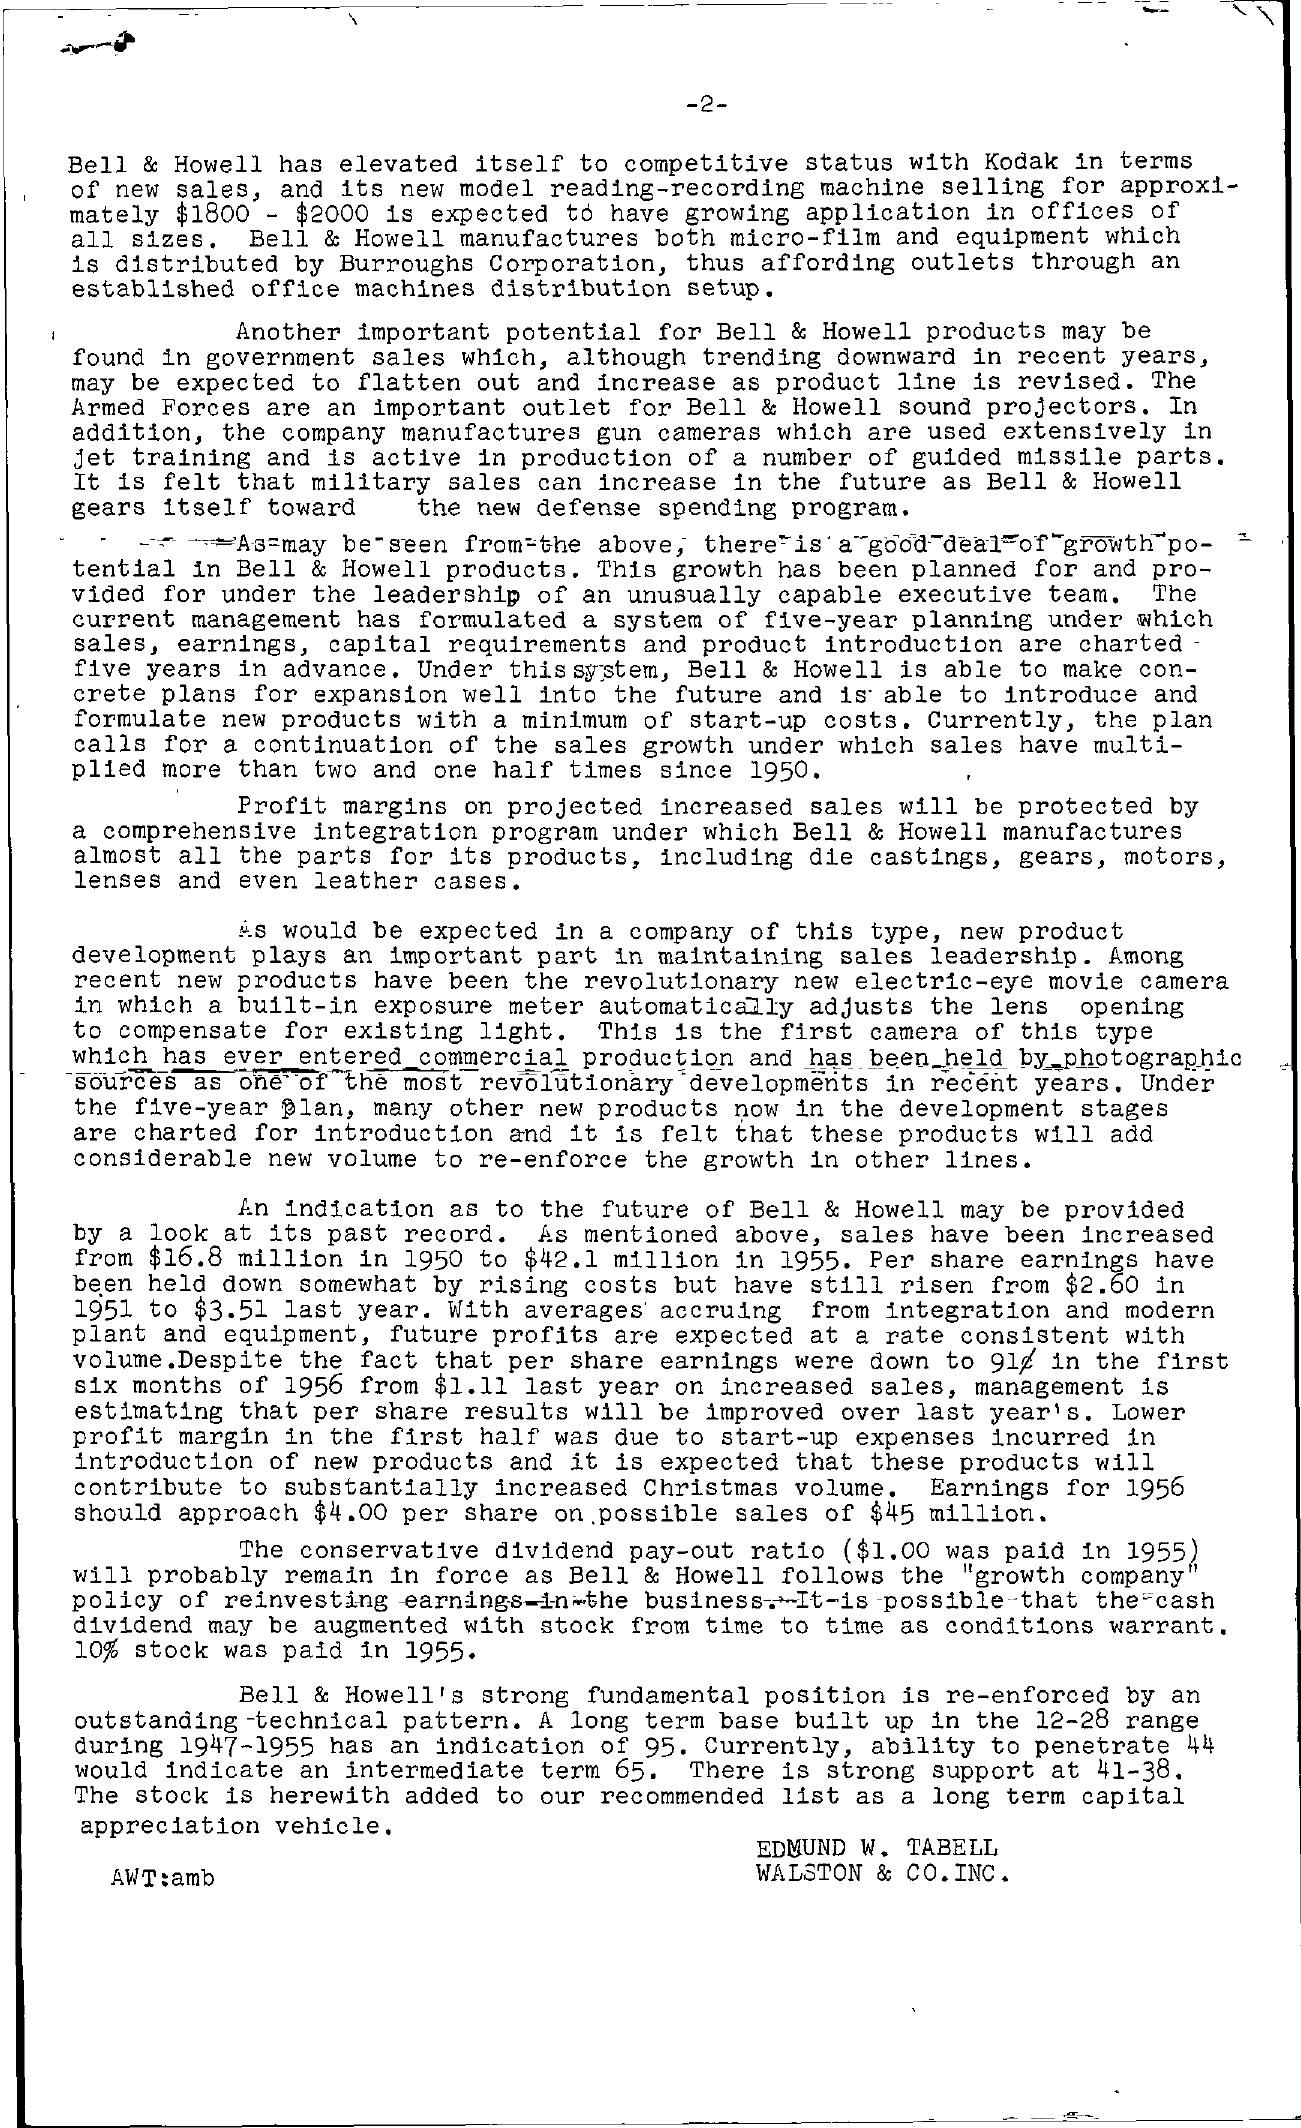 Tabell's Market Letter - September 14, 1956 page 2